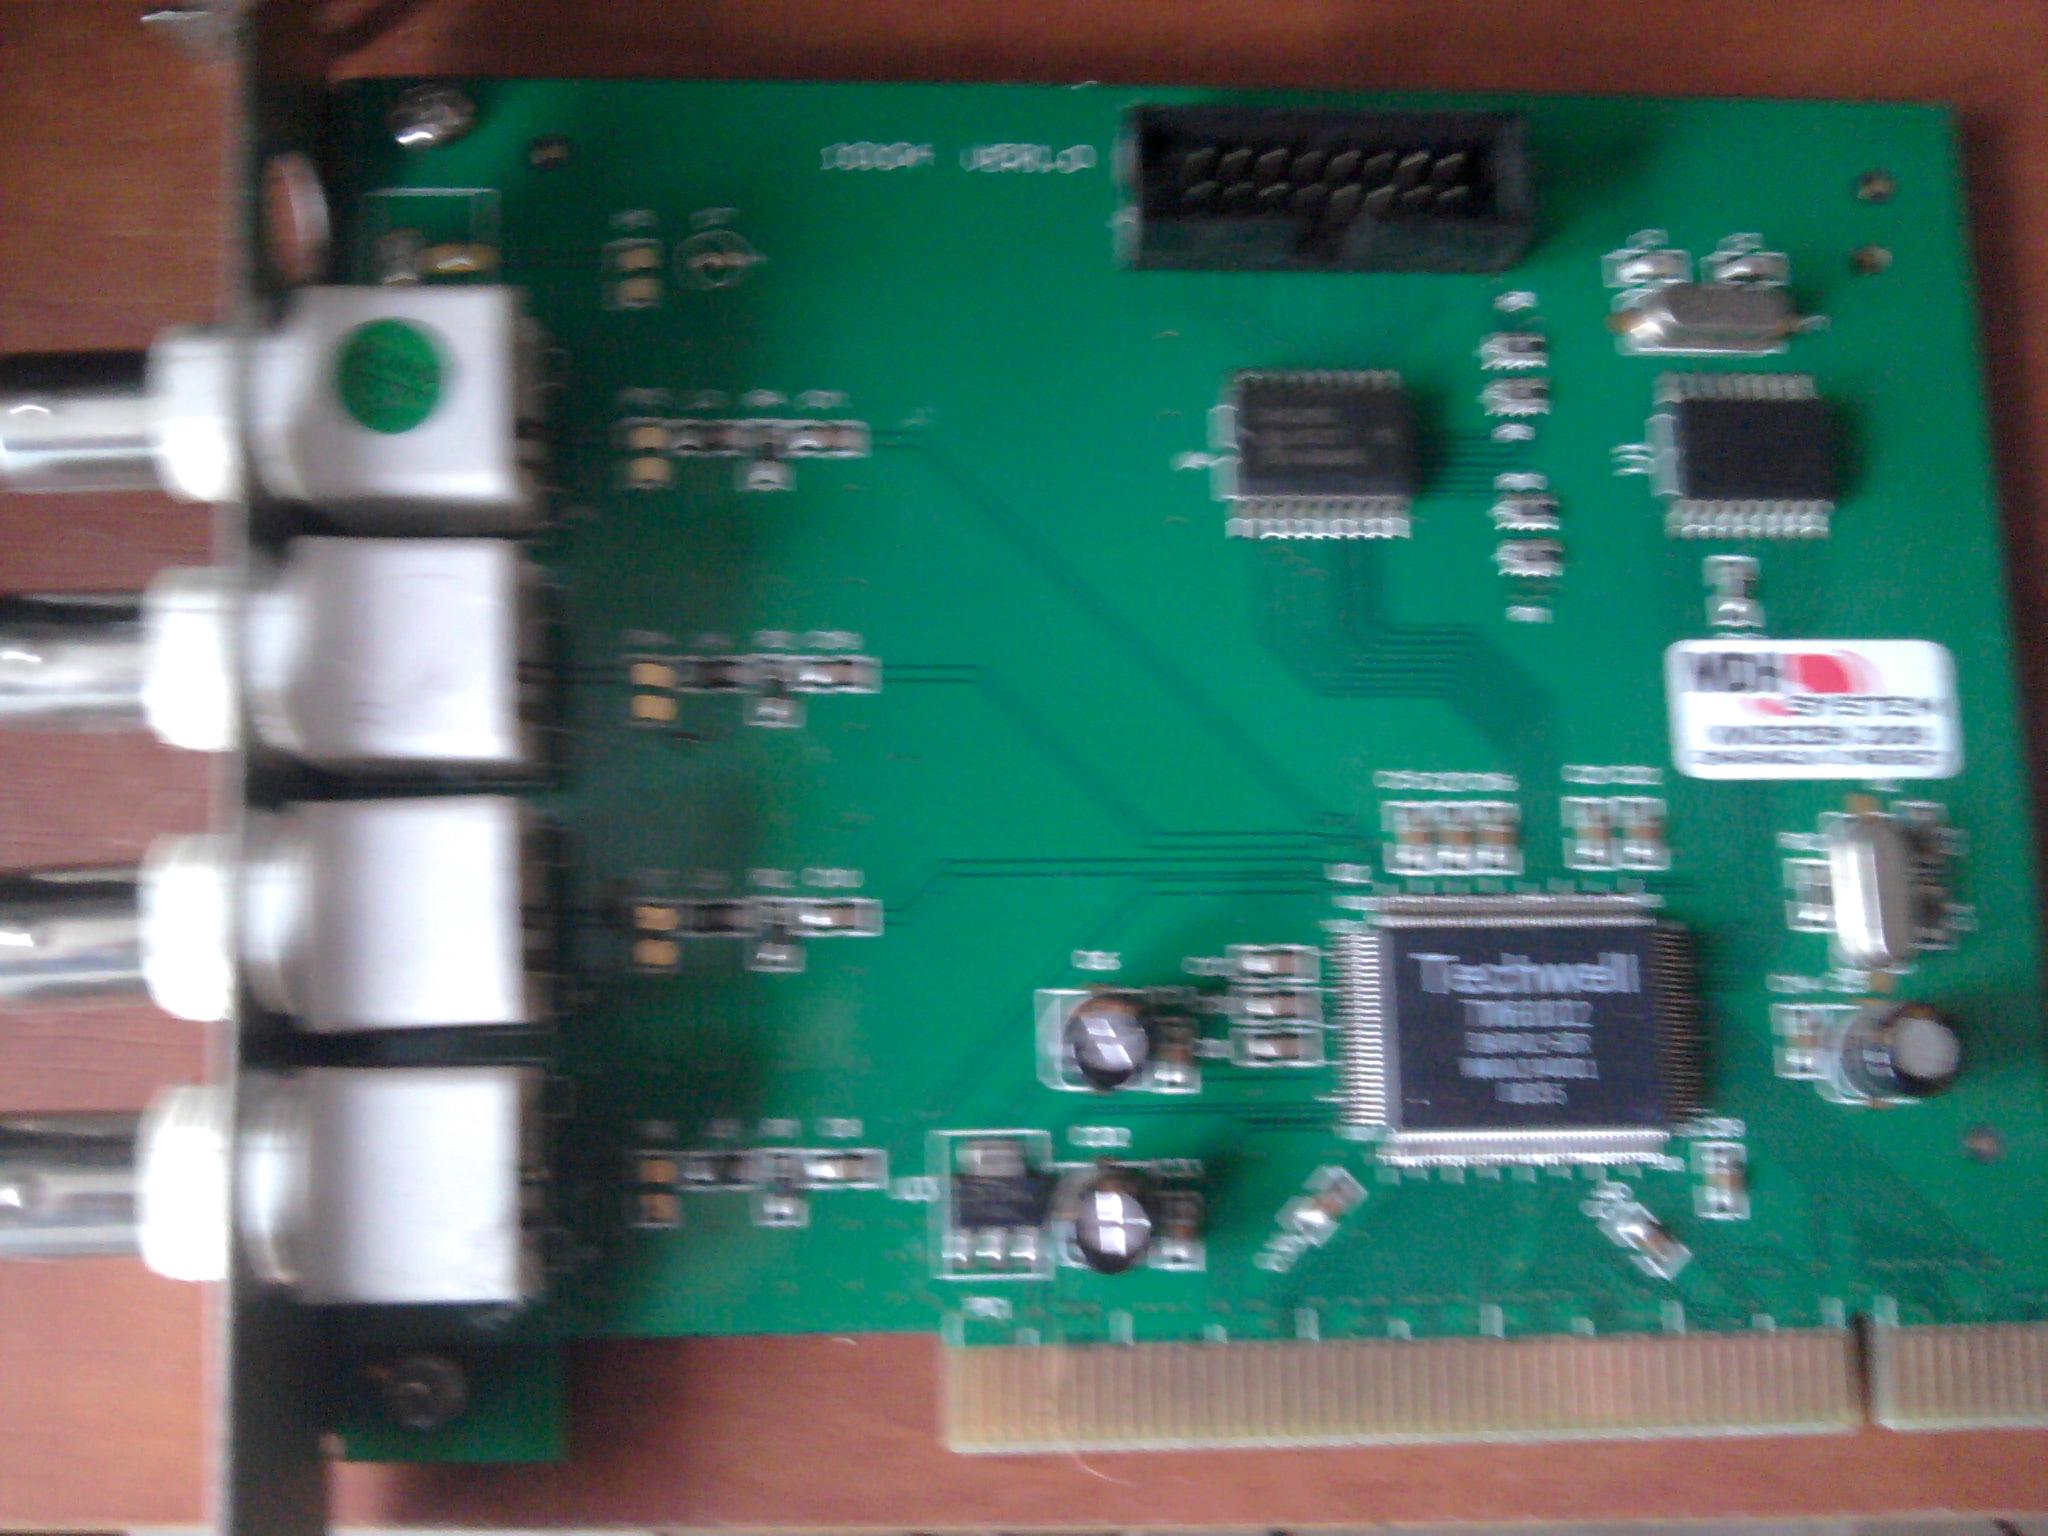 Plx technology pci6140-aa33pc